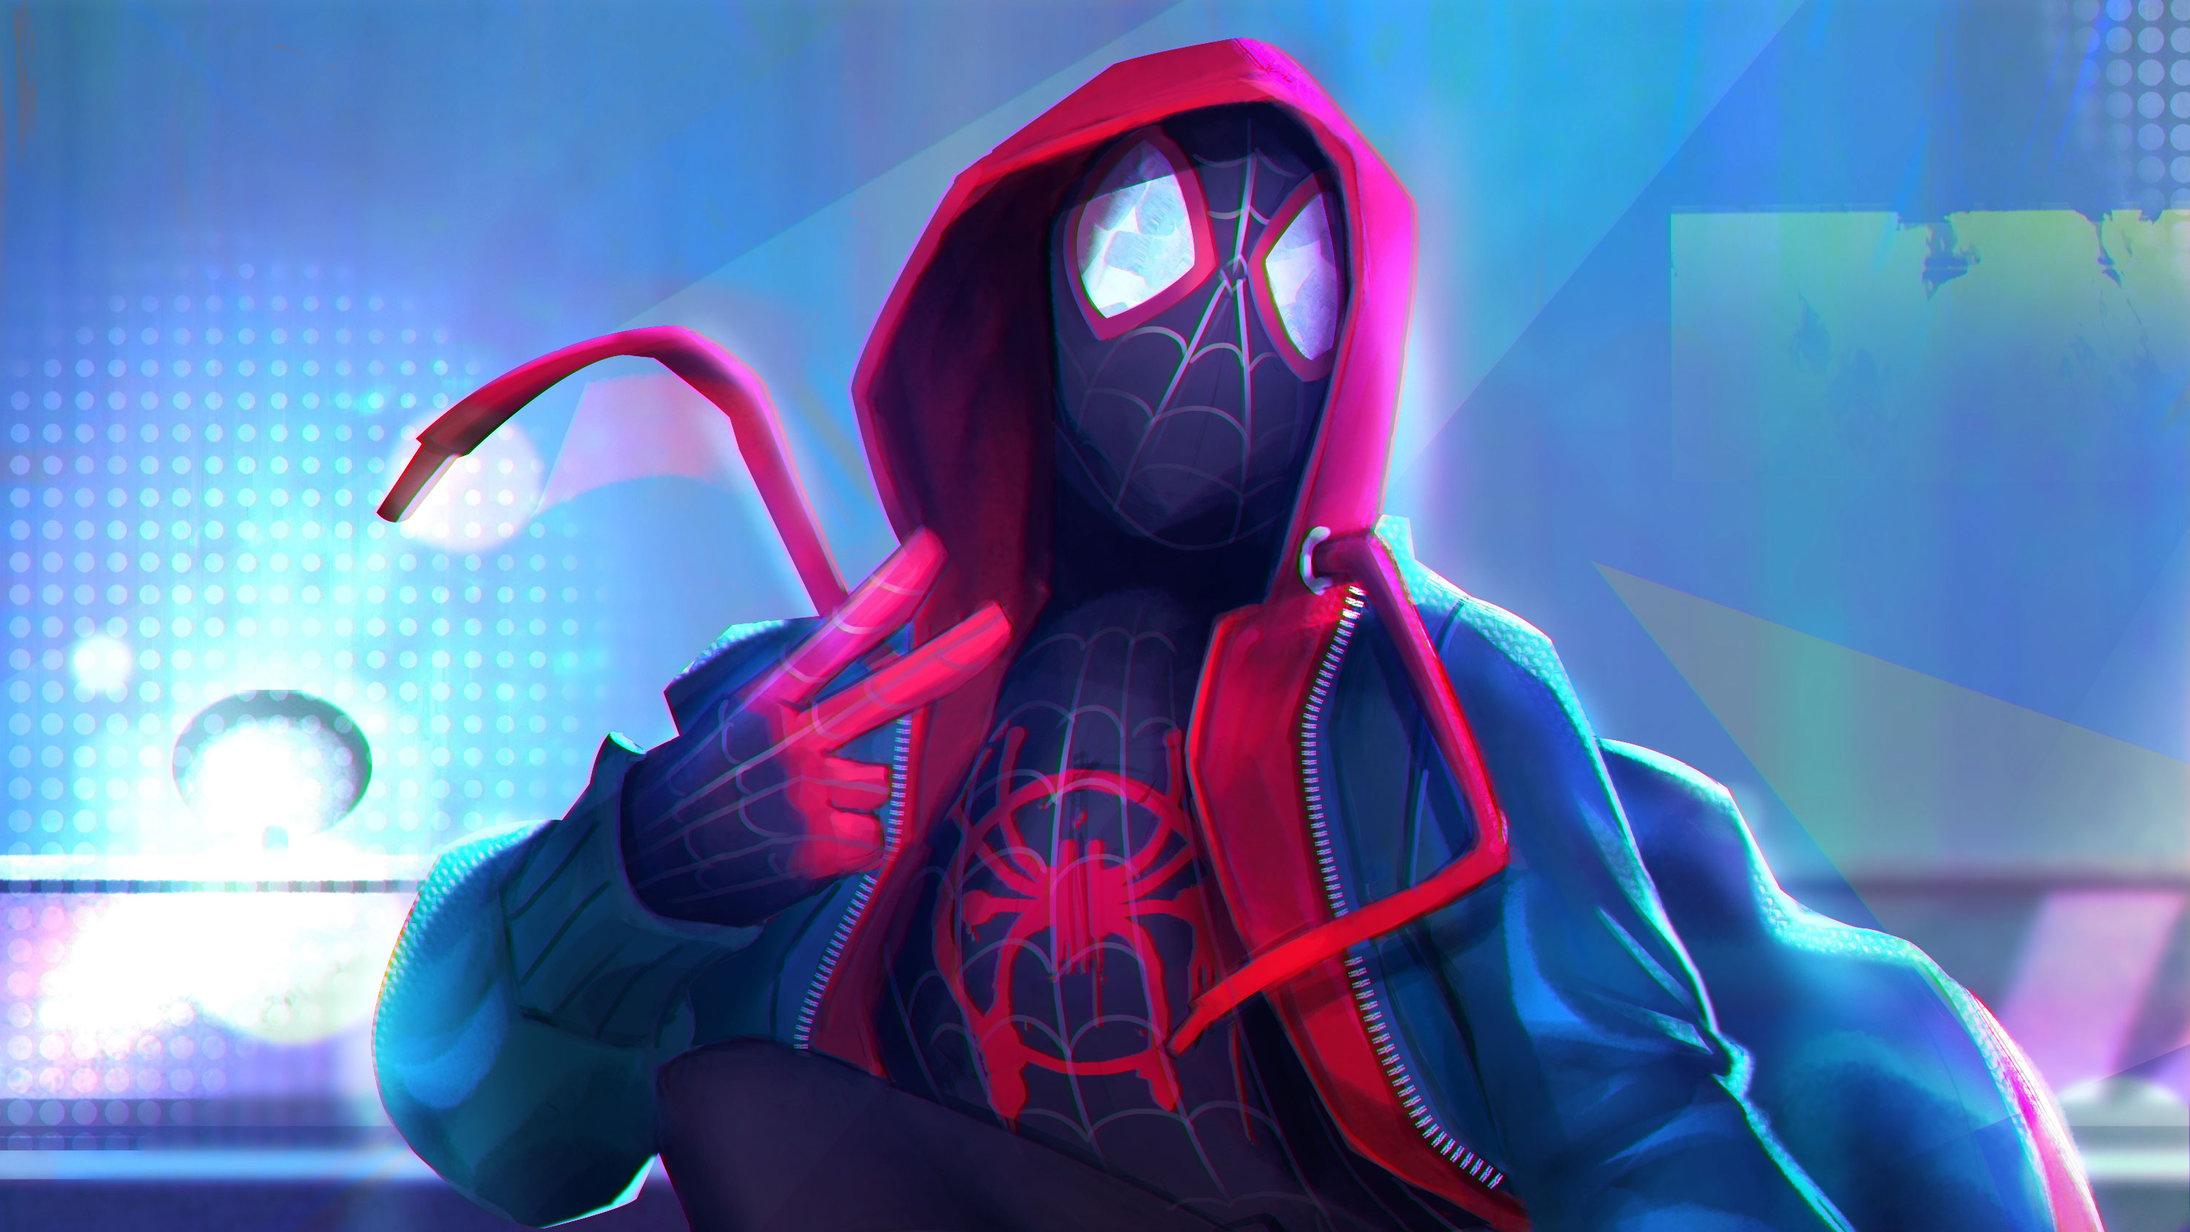 Spider Man Into The Spider Verse 4k 2534209 Hd Wallpaper